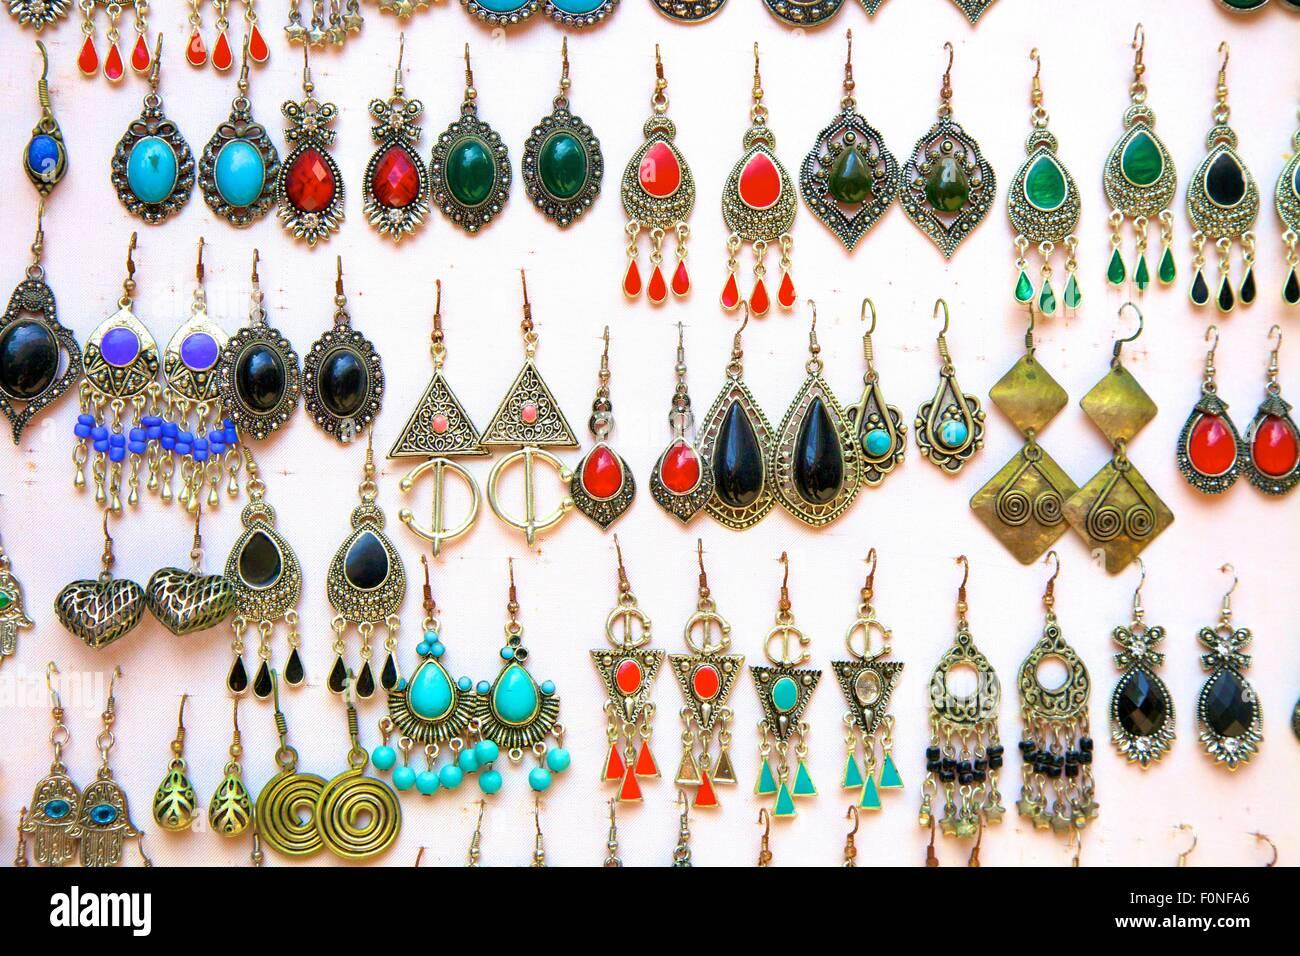 Jewellery Display, The Medina, Rabat, Morocco, North Africa - Stock Image